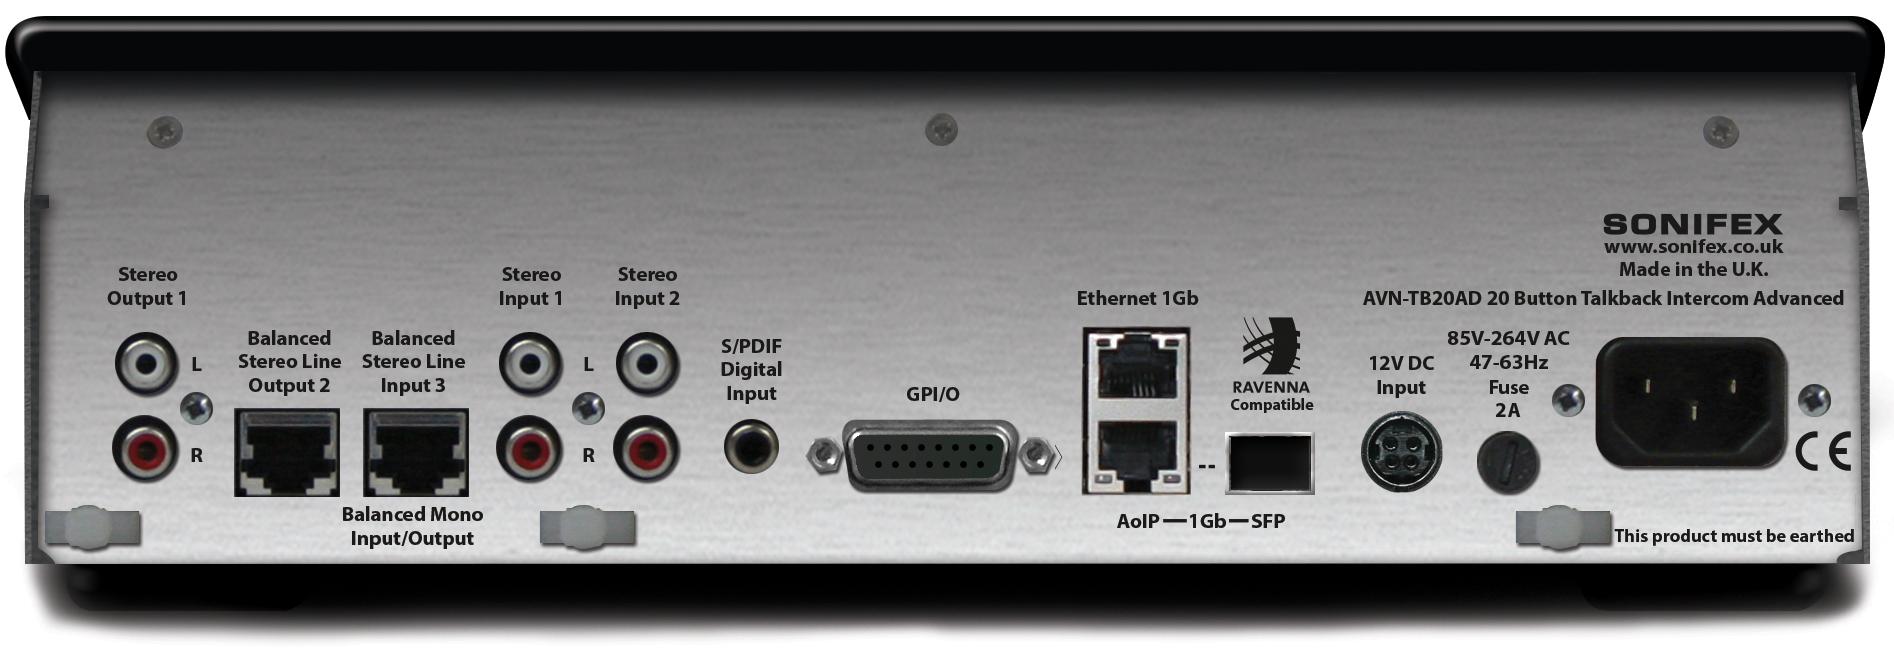 Sonifex Avn Tb20ad 20 Button Advanced Talkback Intercom Aoip Fuse Box Buttons High Resolution Image Of Rear View